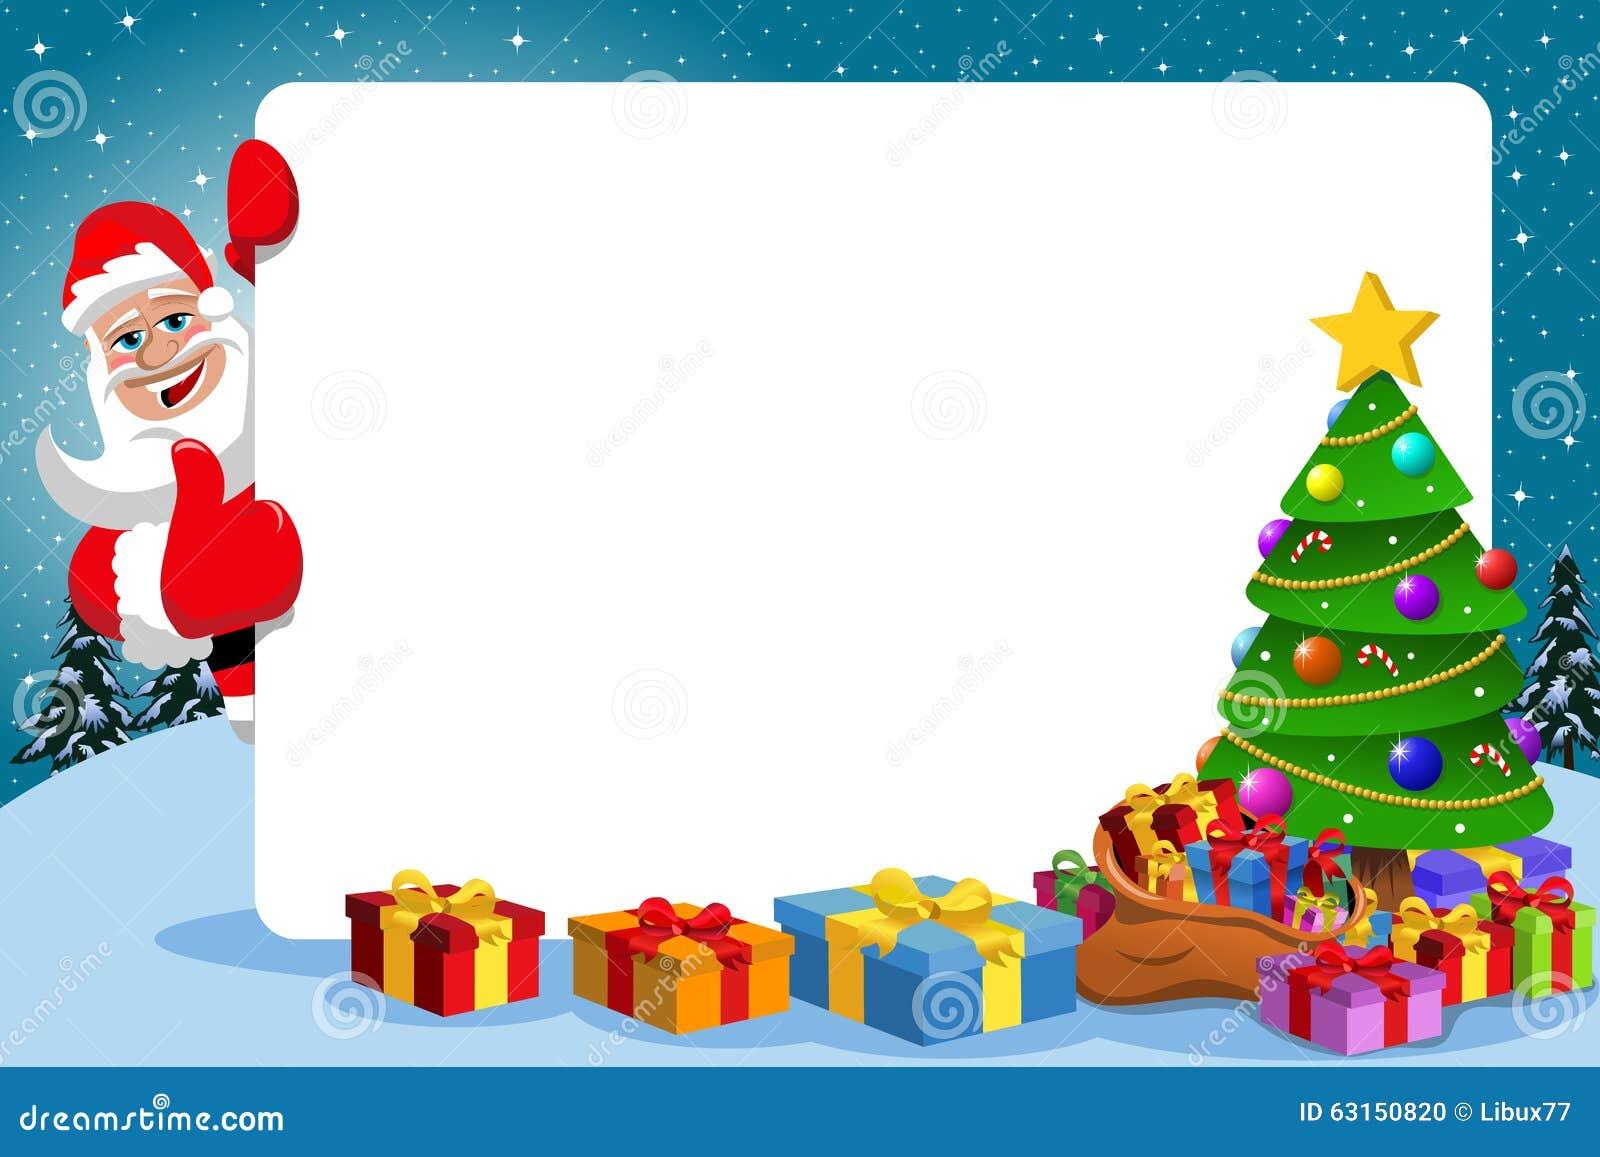 Santa Claus Thumb Up Frame Xmas Tree Stock Vector - Illustration of ...